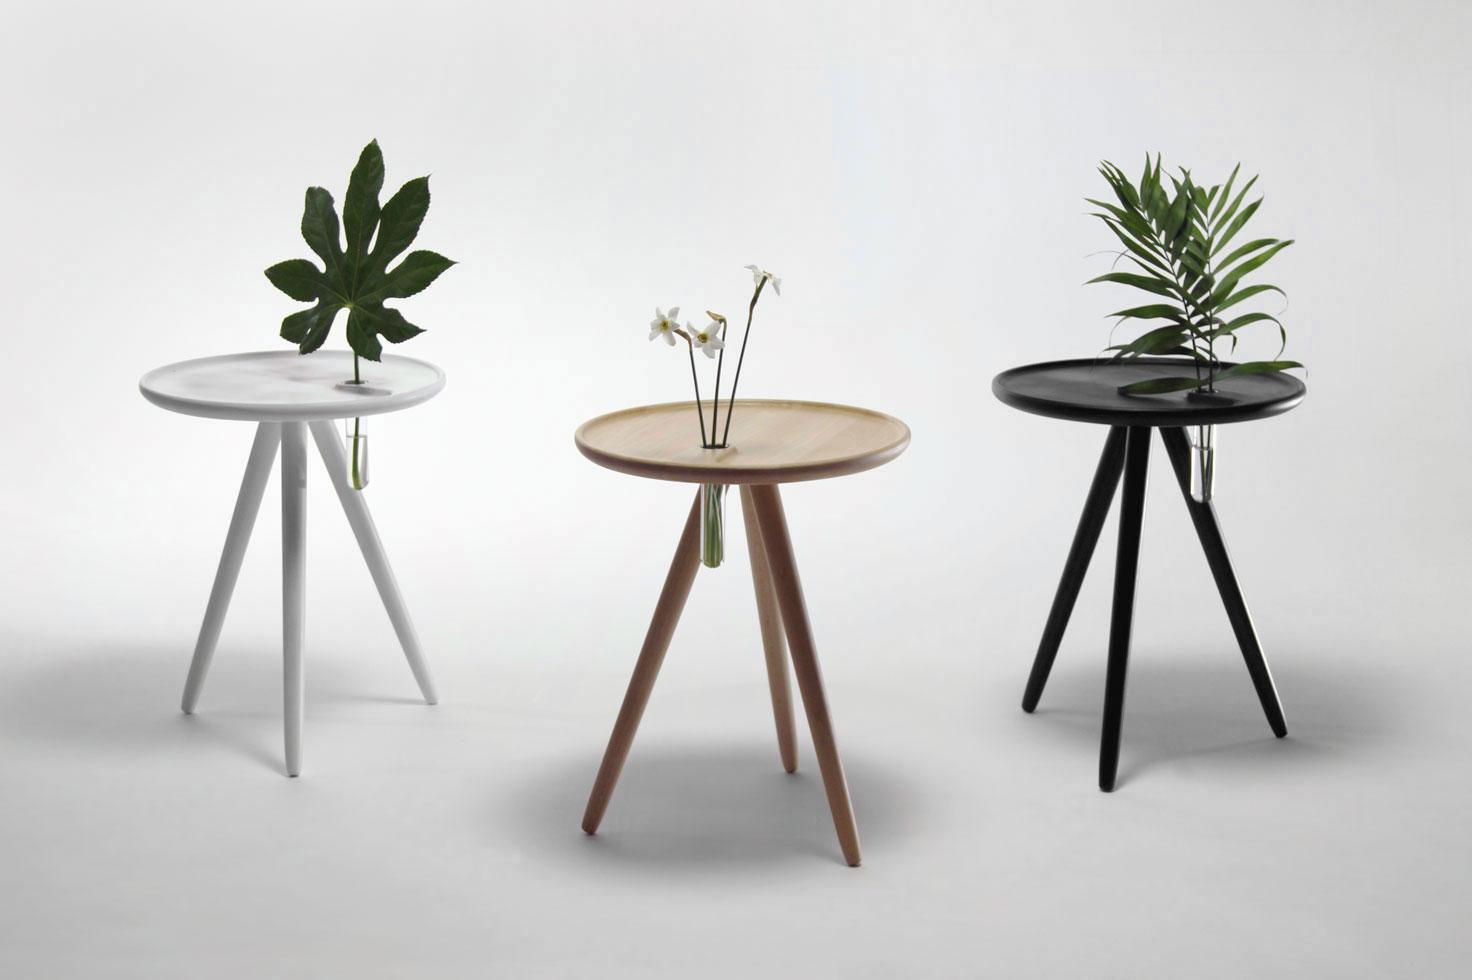 Flower Table For Iker Werteloberfell Gbr